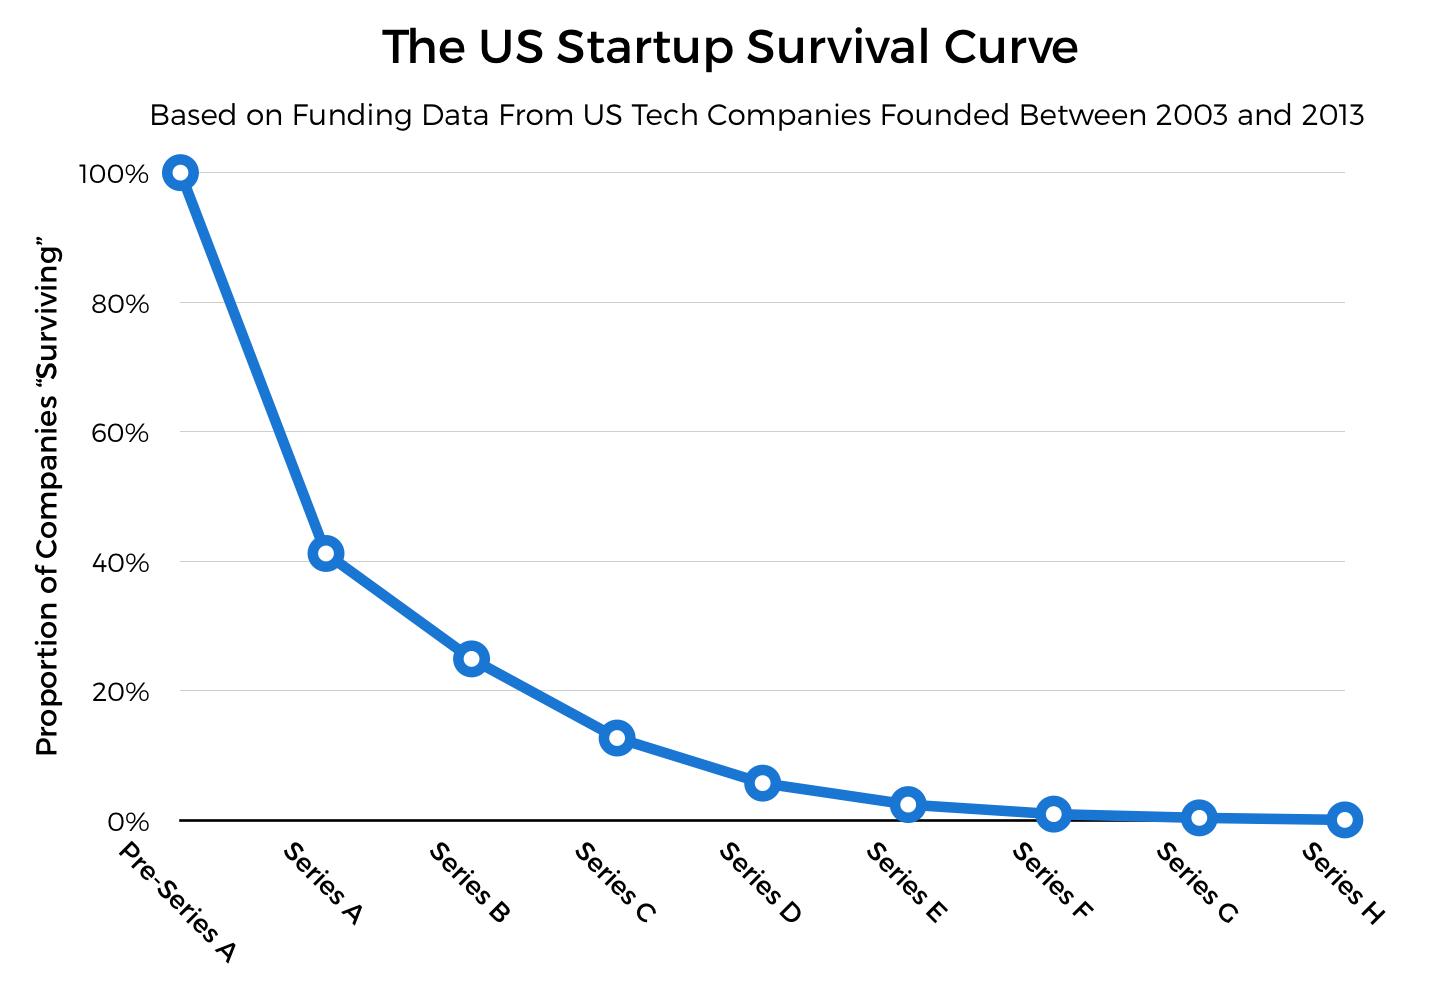 Startup survival curve